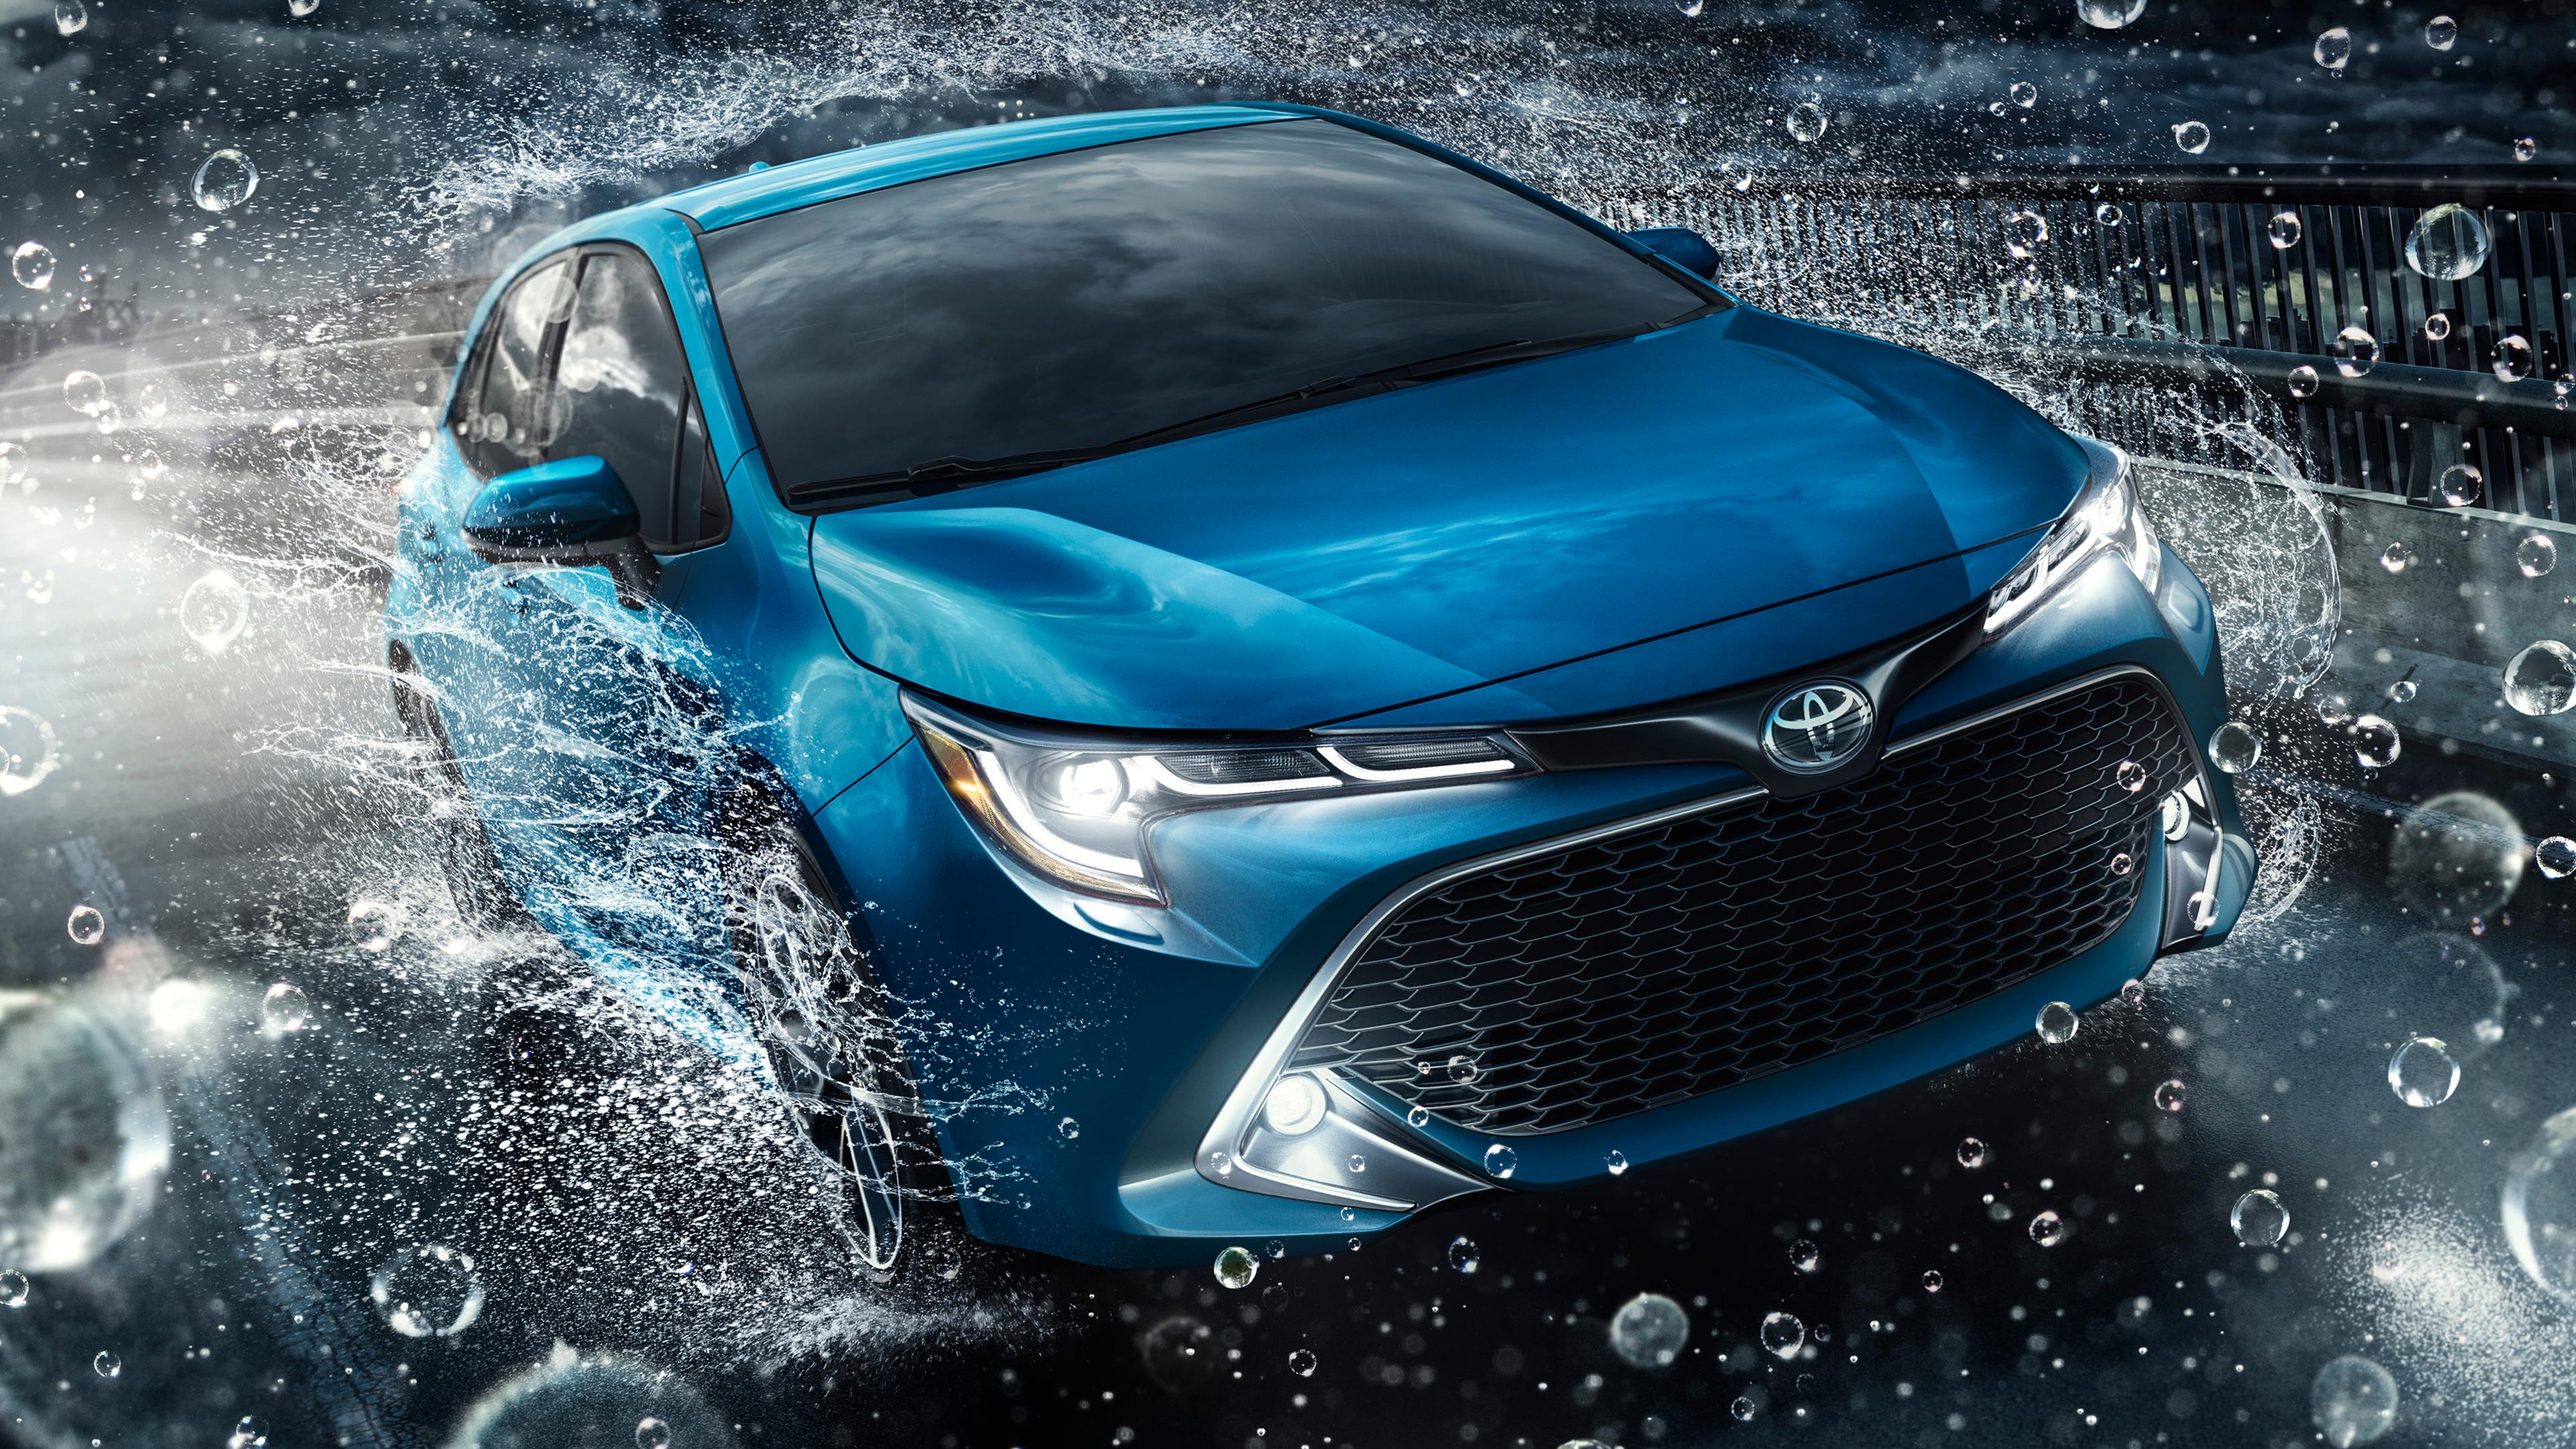 2019 Toyota Corolla Xse Hatchback 4k 2 Wallpaper Hd Car Wallpapers